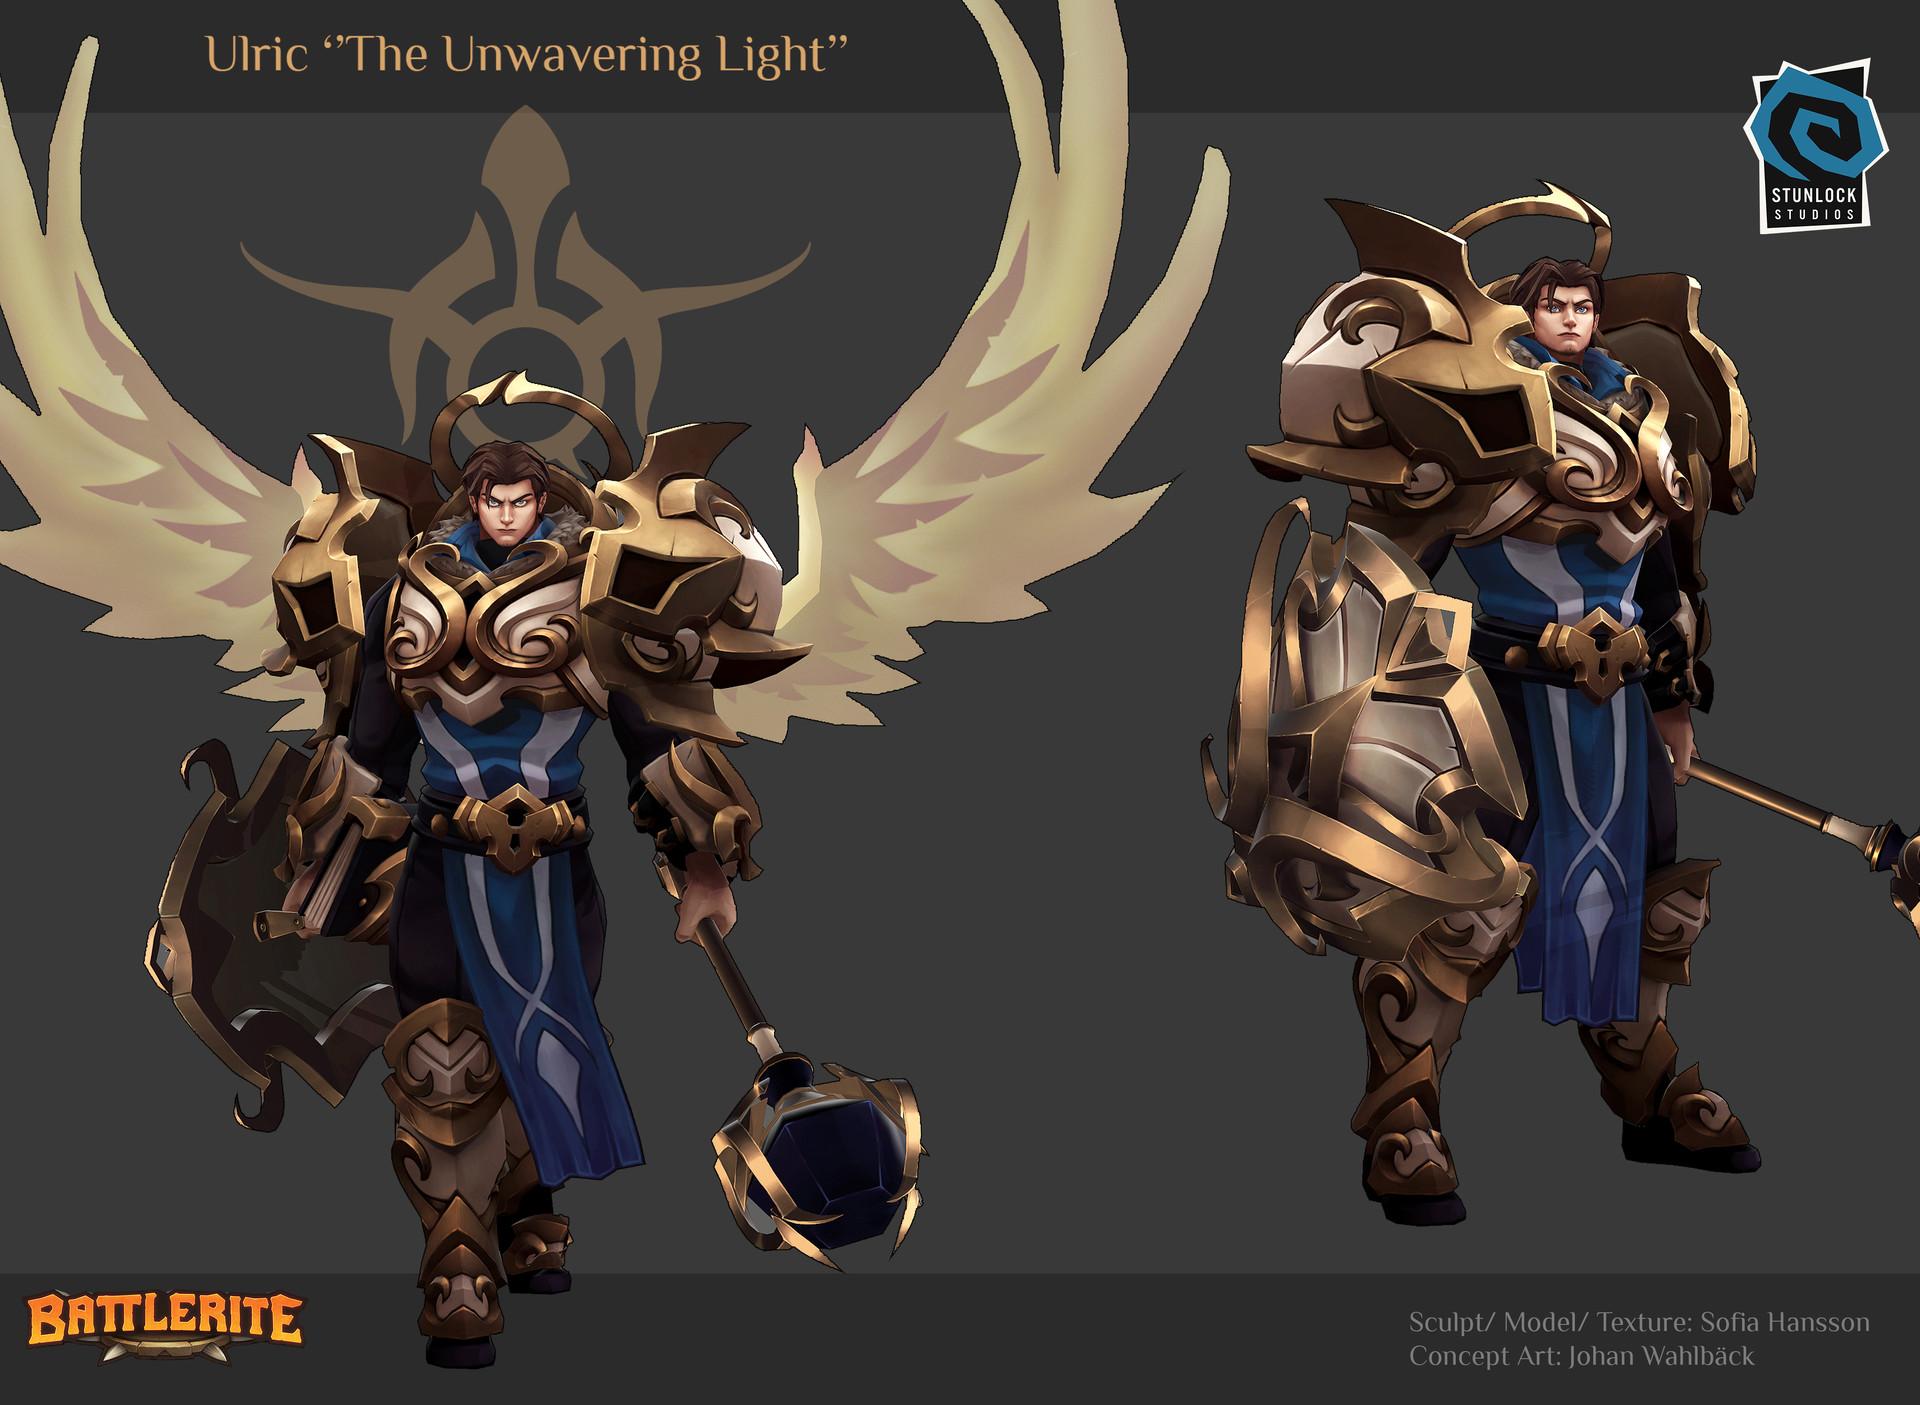 Ulric, The Unwavering Light - Battlerite Арт